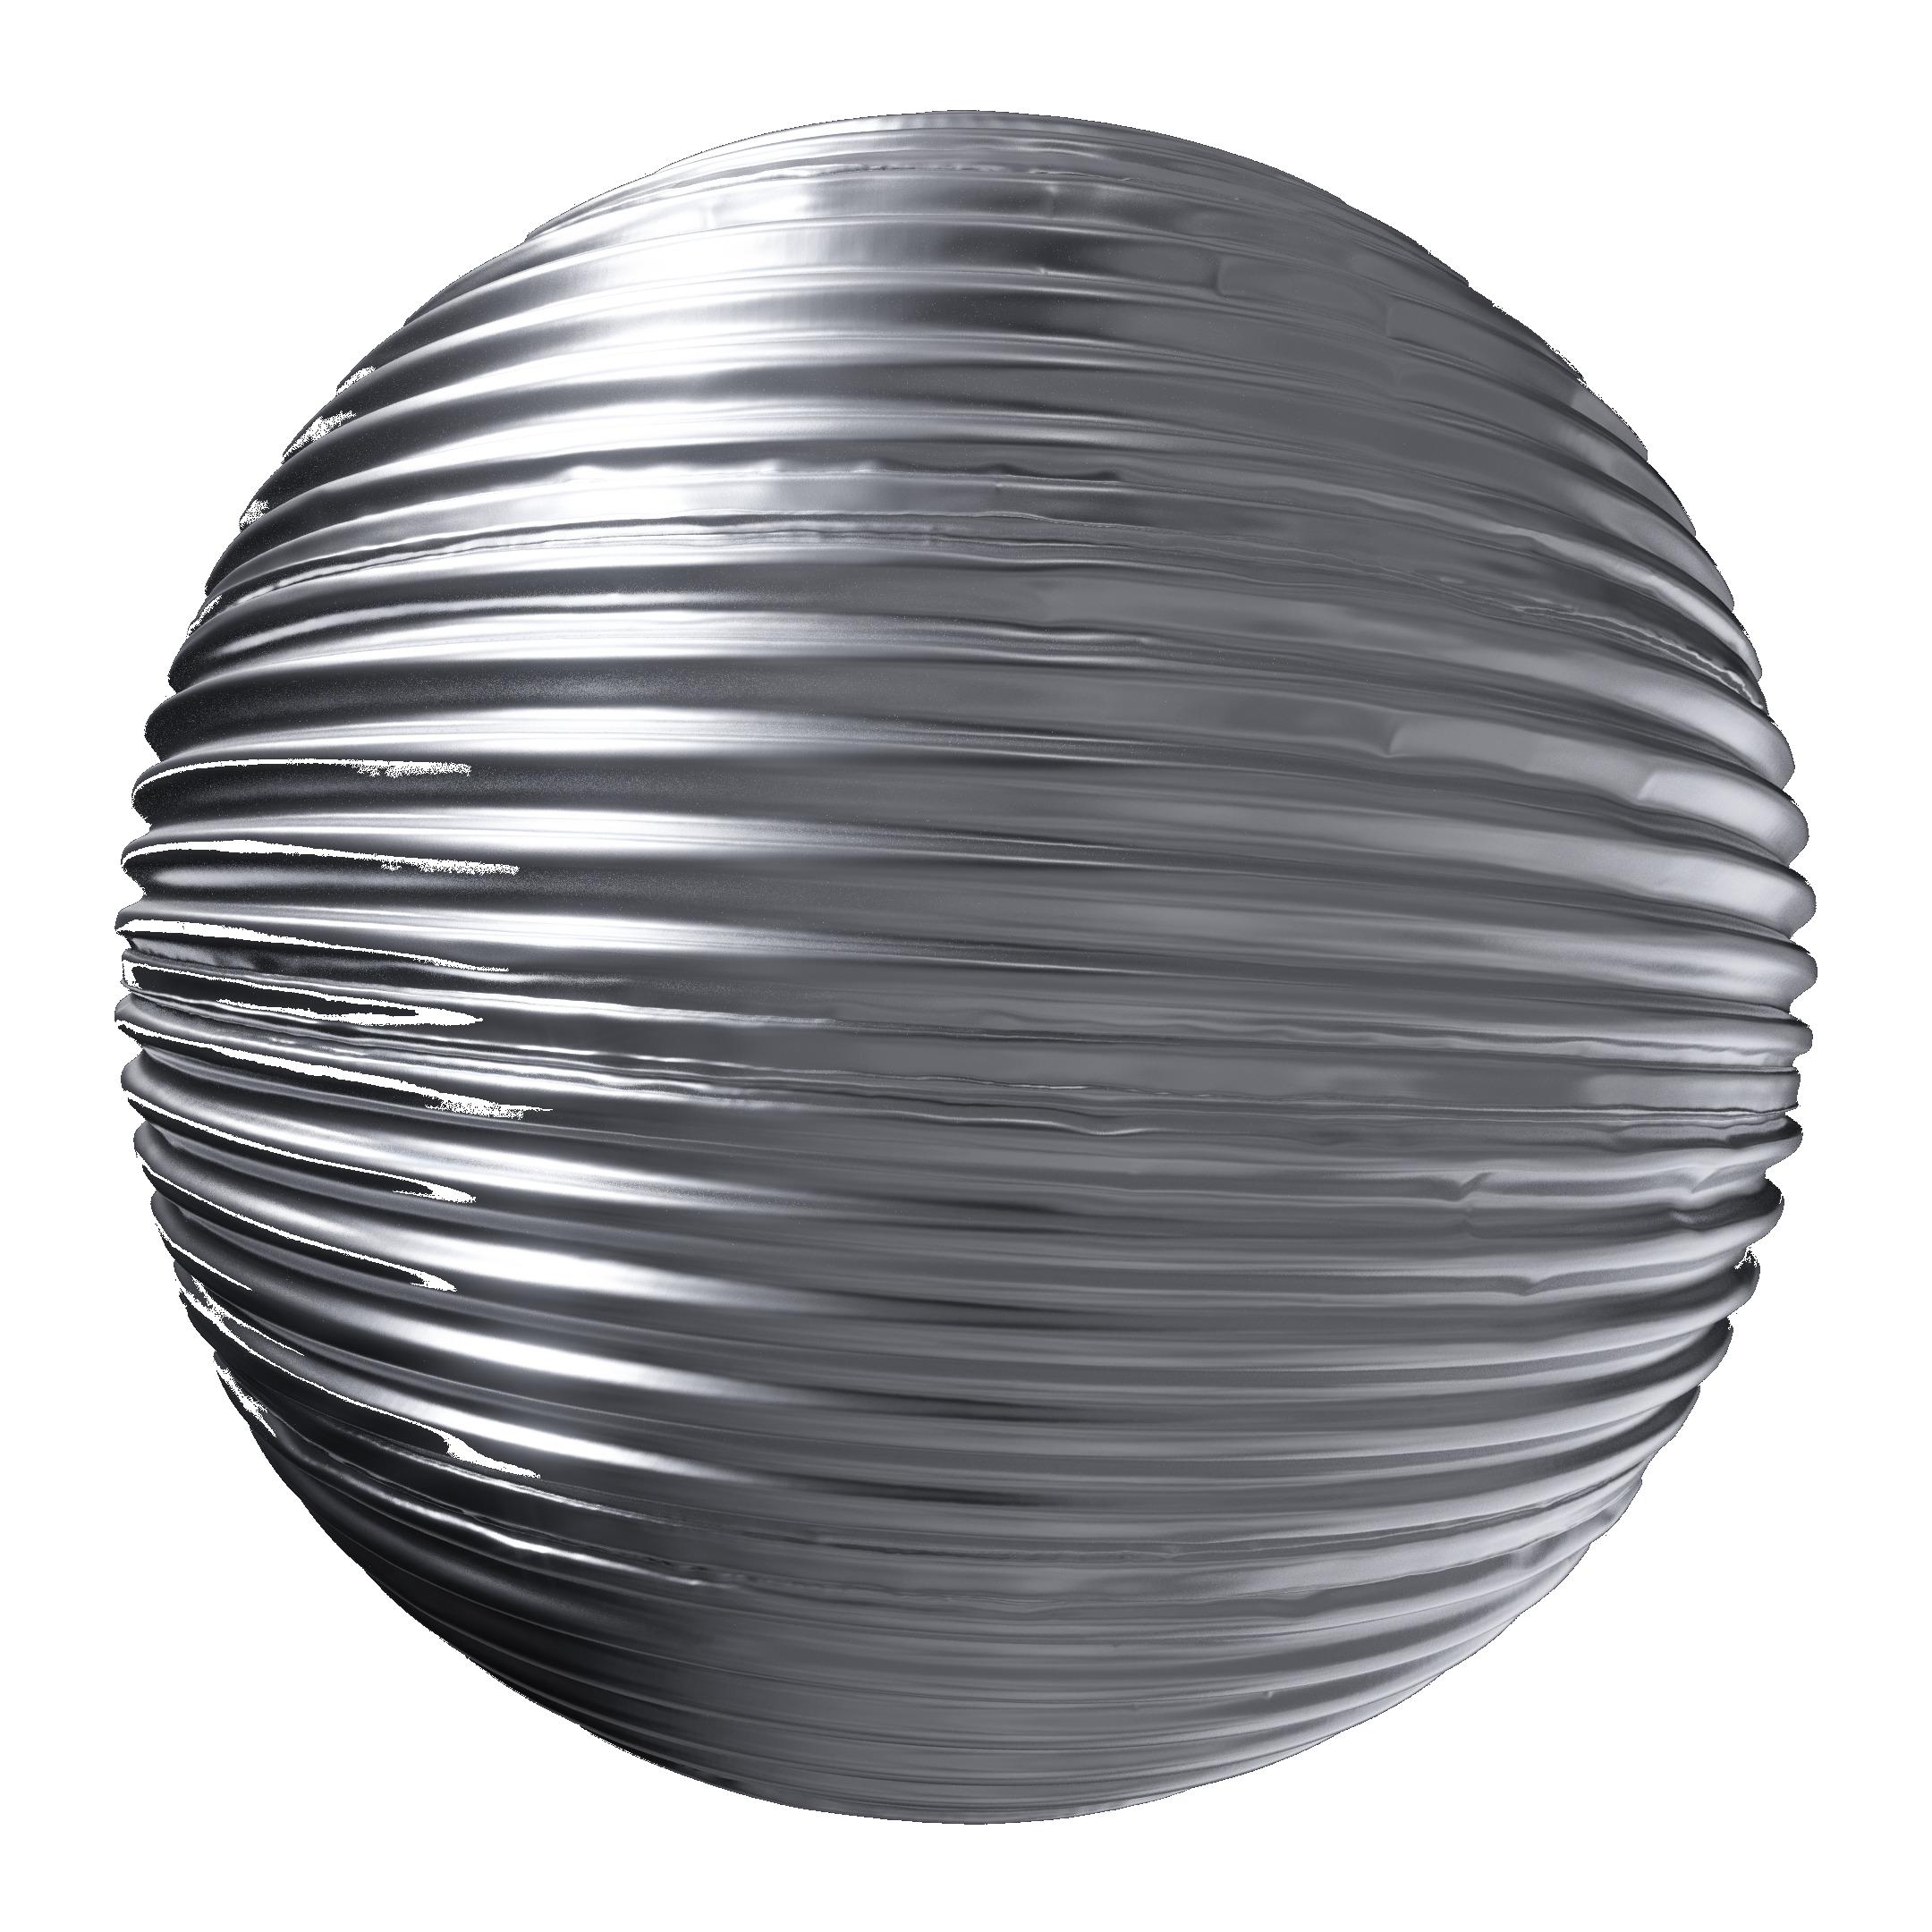 TexturesCom_Aluminium_Pipe_Expanded_header4 copy.png